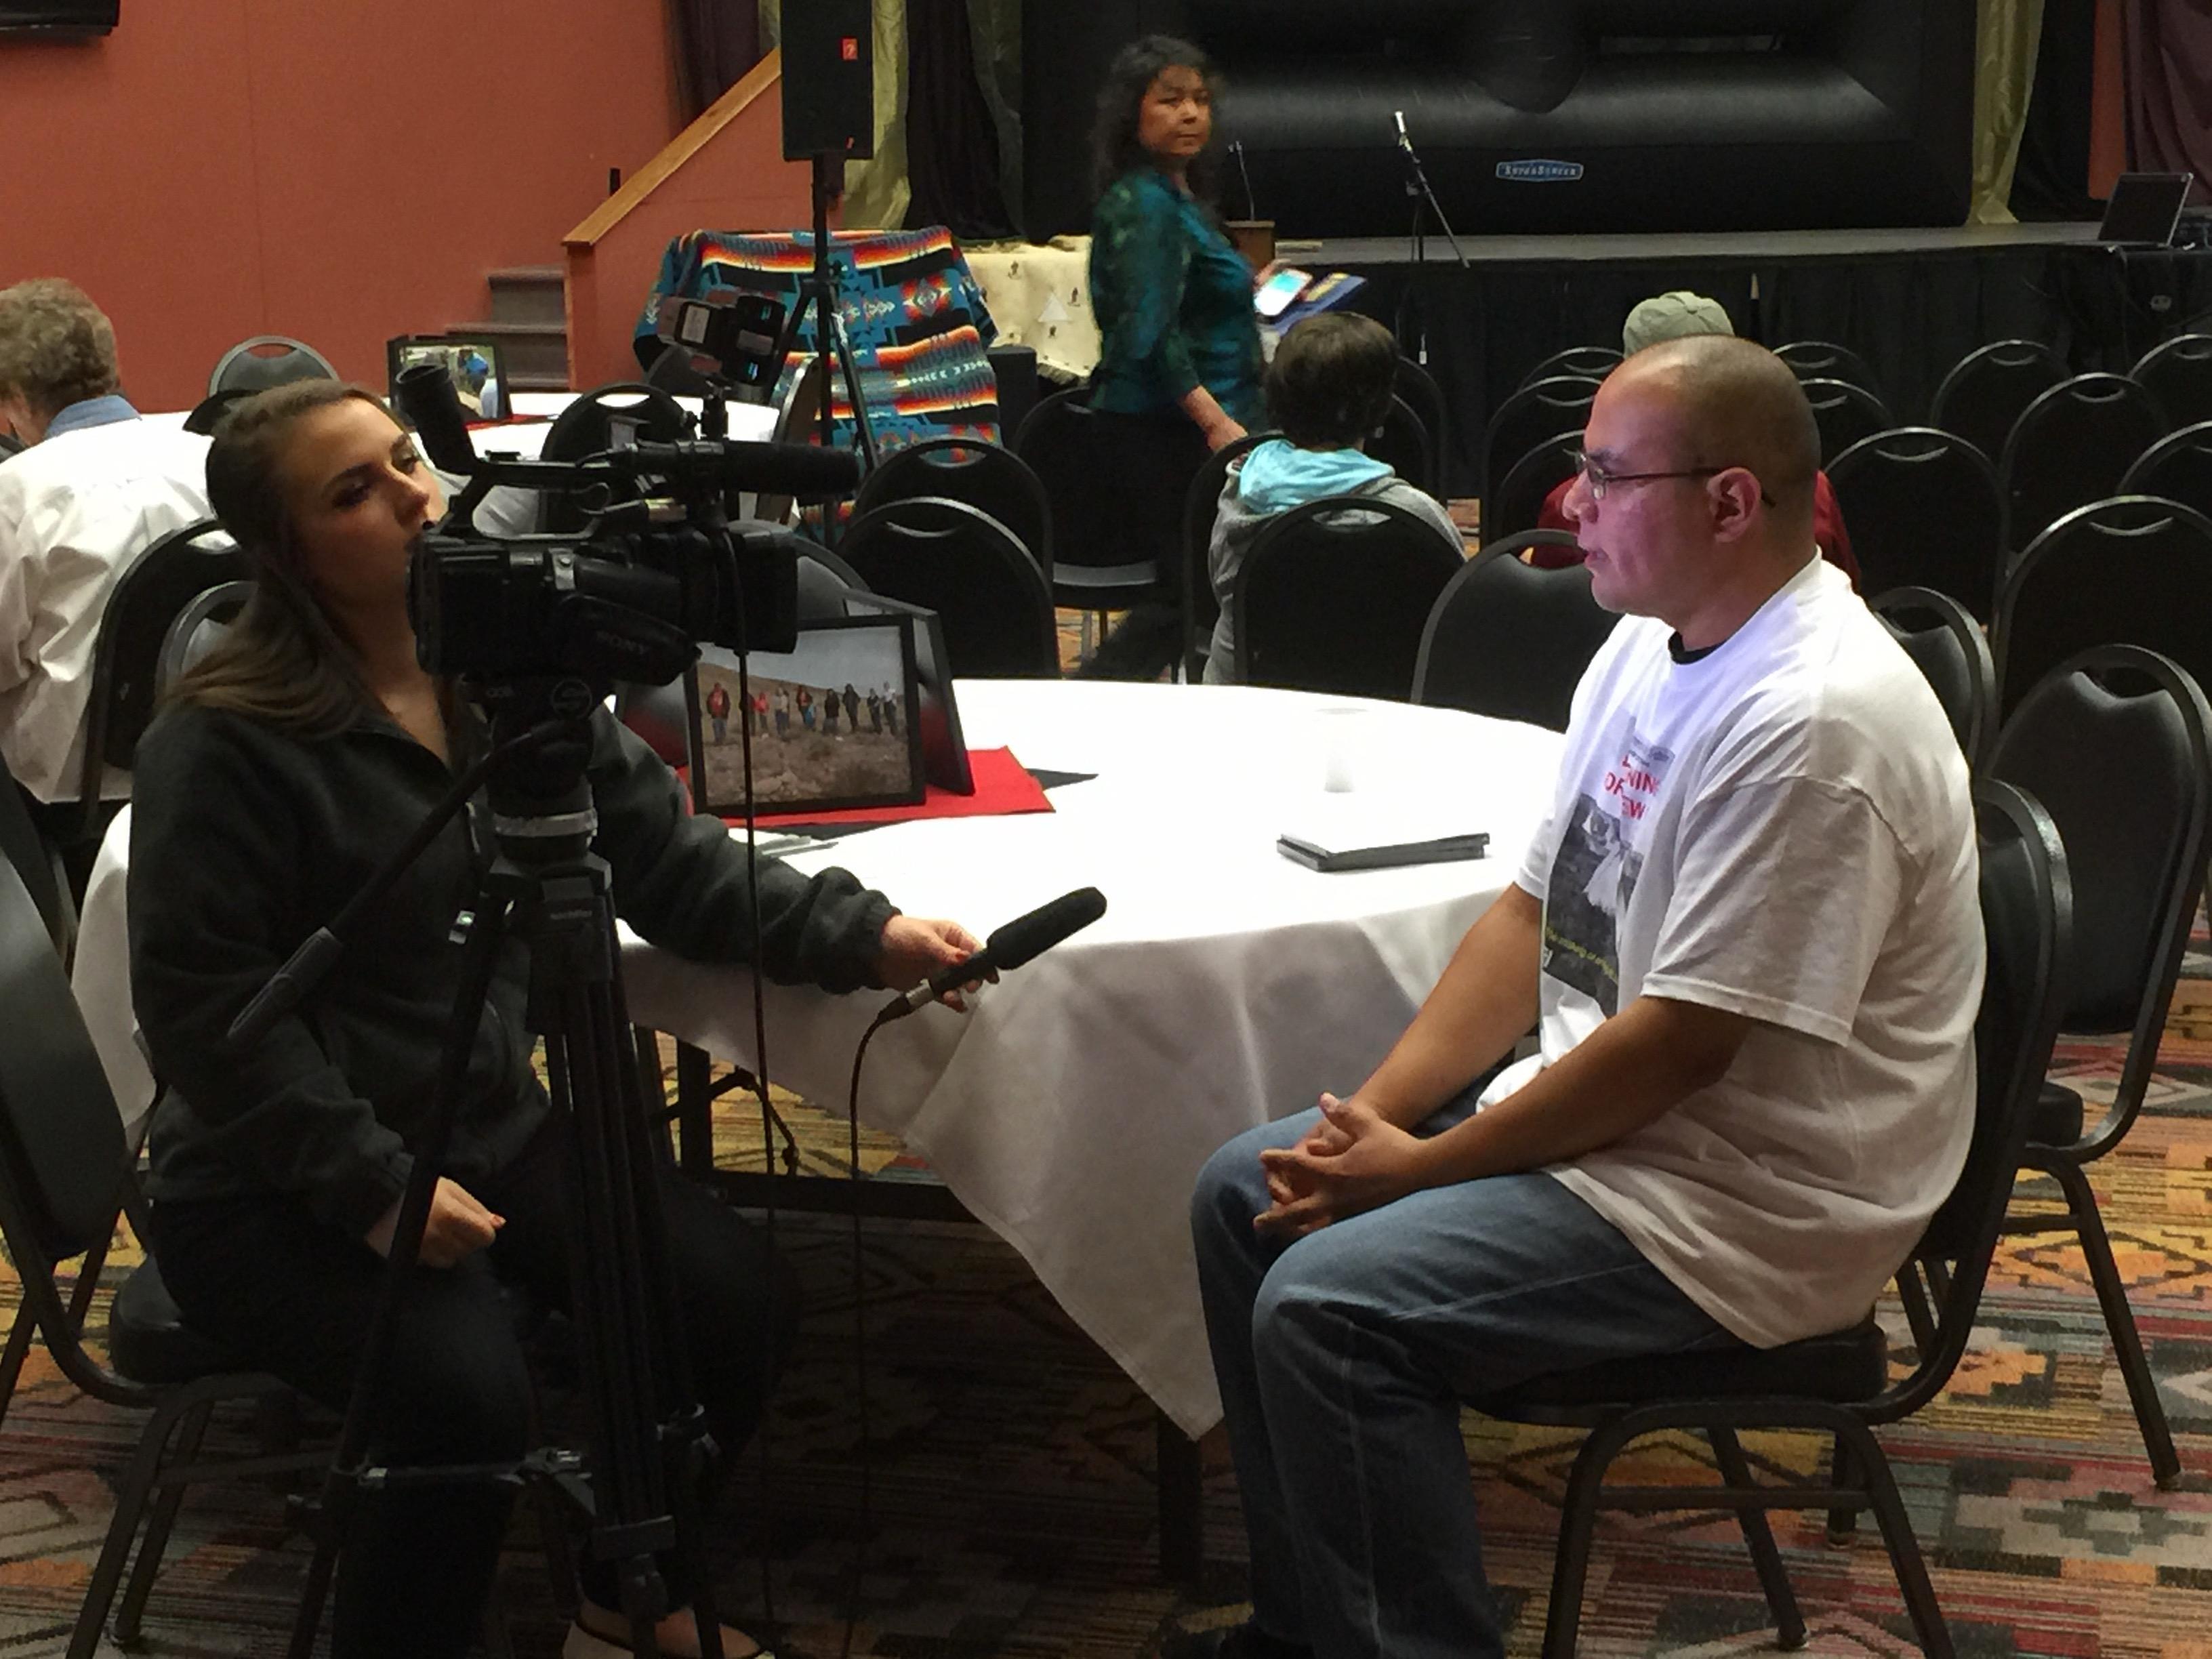 Ryan Tyler interviewed